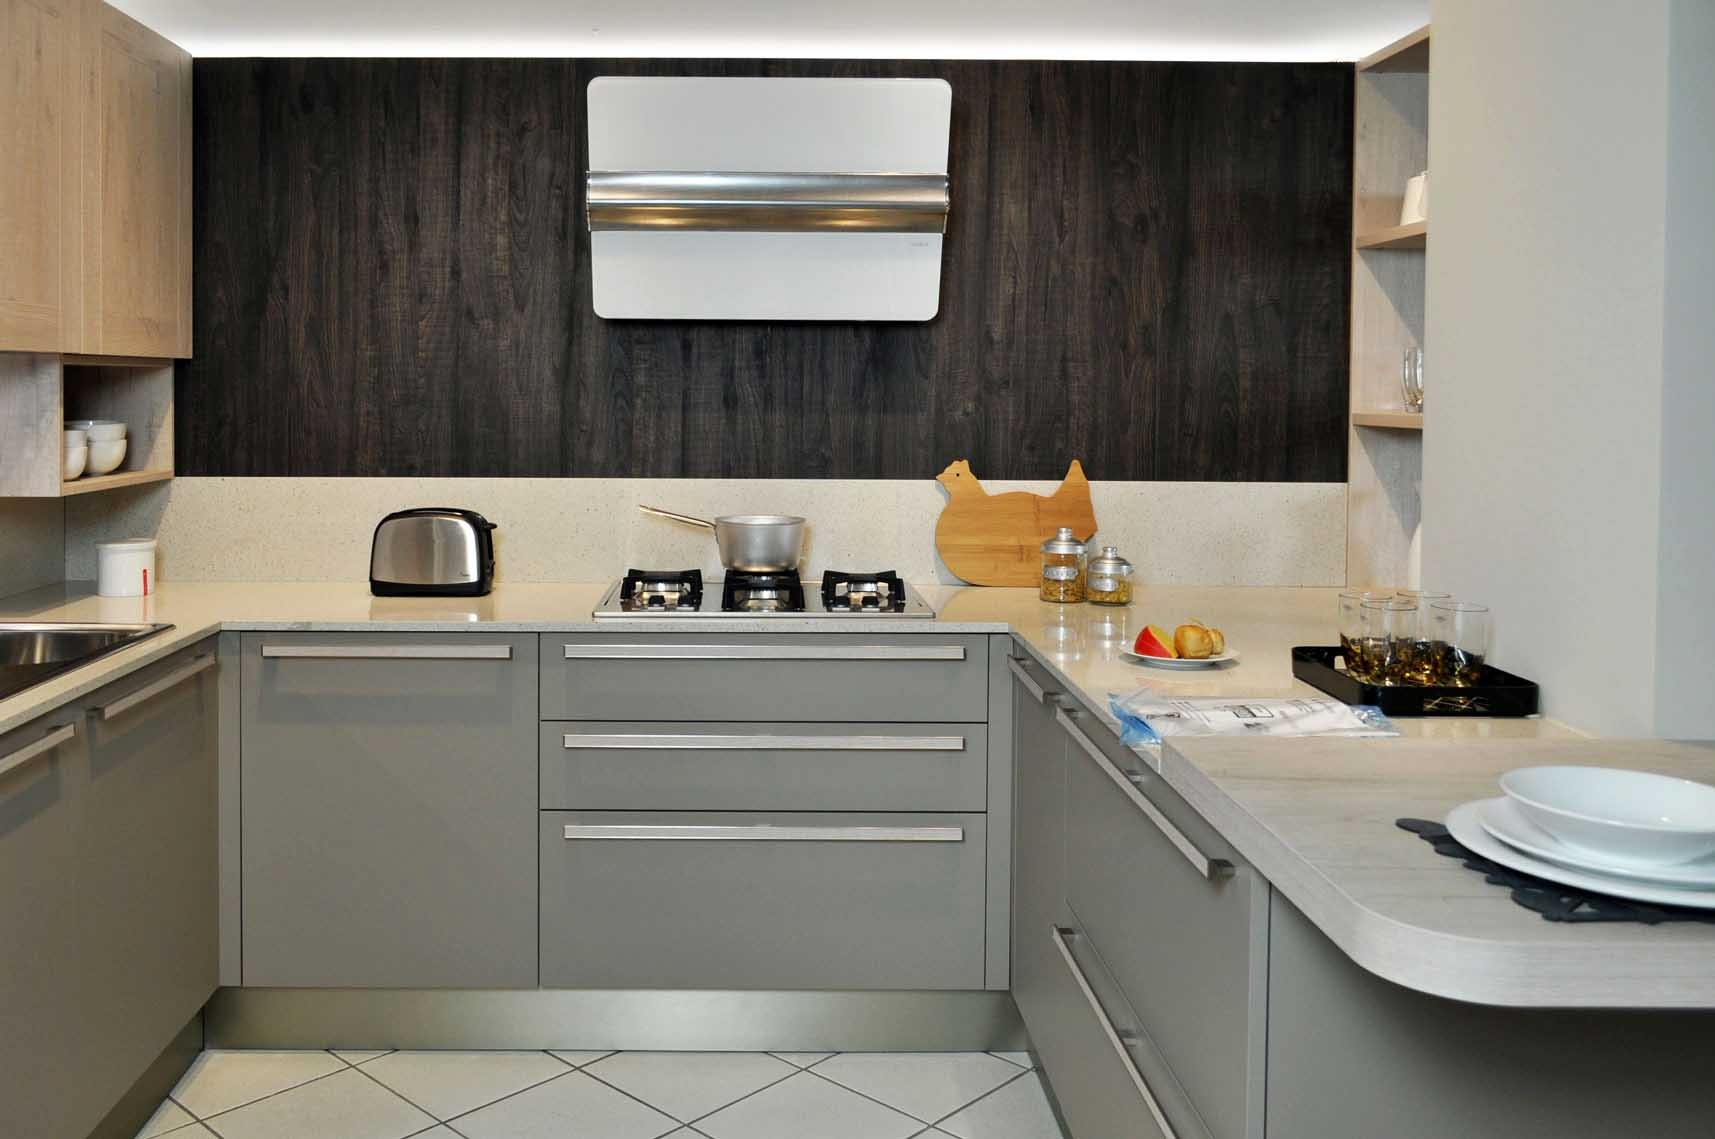 Arredalcasa cucine prodotti showroom cucine lube toscana for Cucine da esposizione scontate